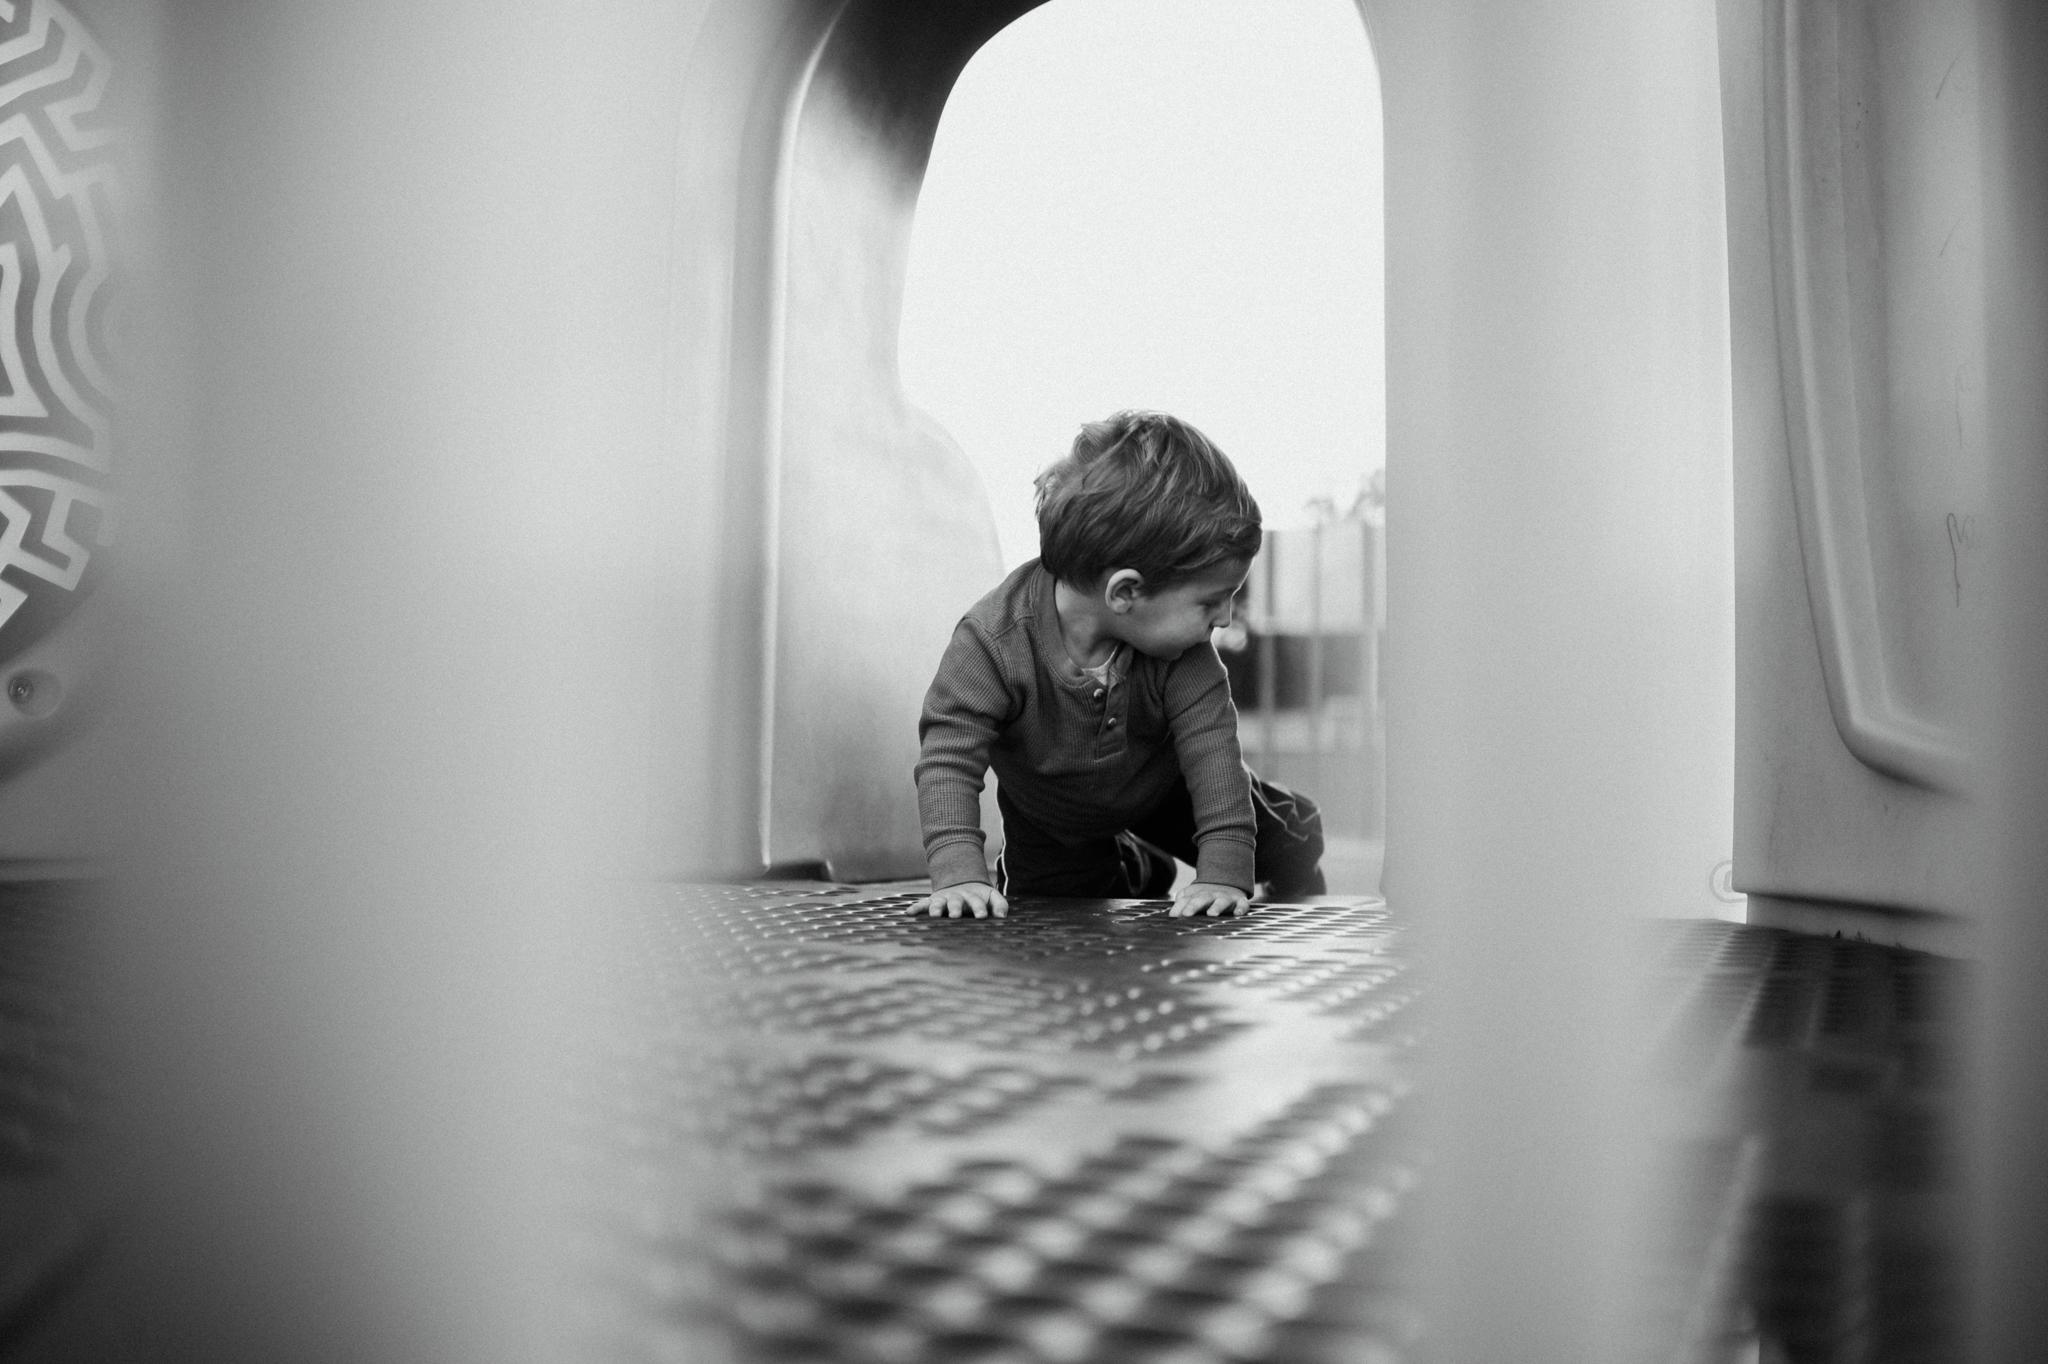 baton rouge, louisiana lifestyle family and children photographer. the best documentary style photography.